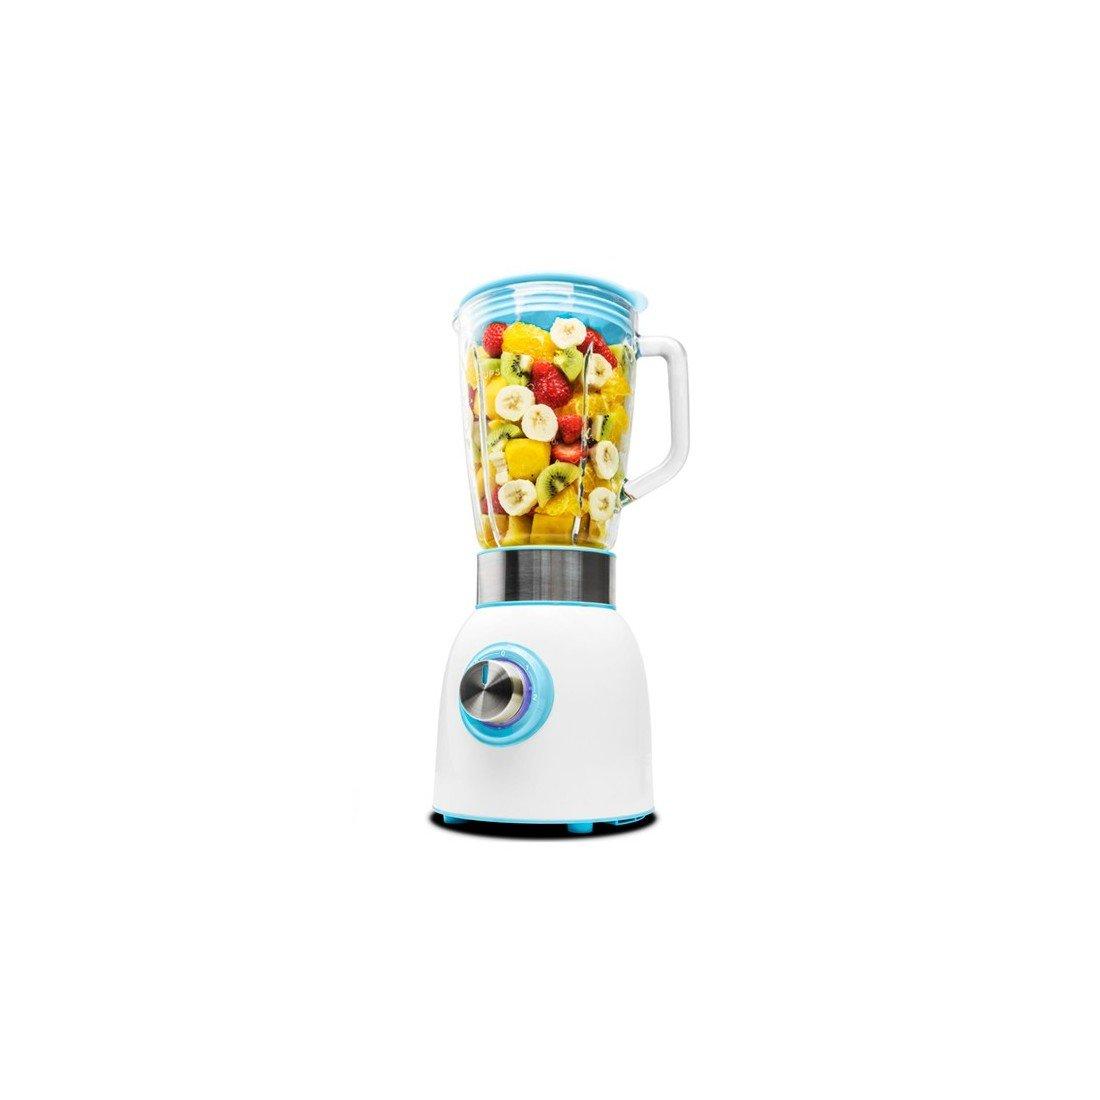 Bicchiere frullatore cecomix power titanium 1000 (1000044877): Amazon.es: Deportes y aire libre